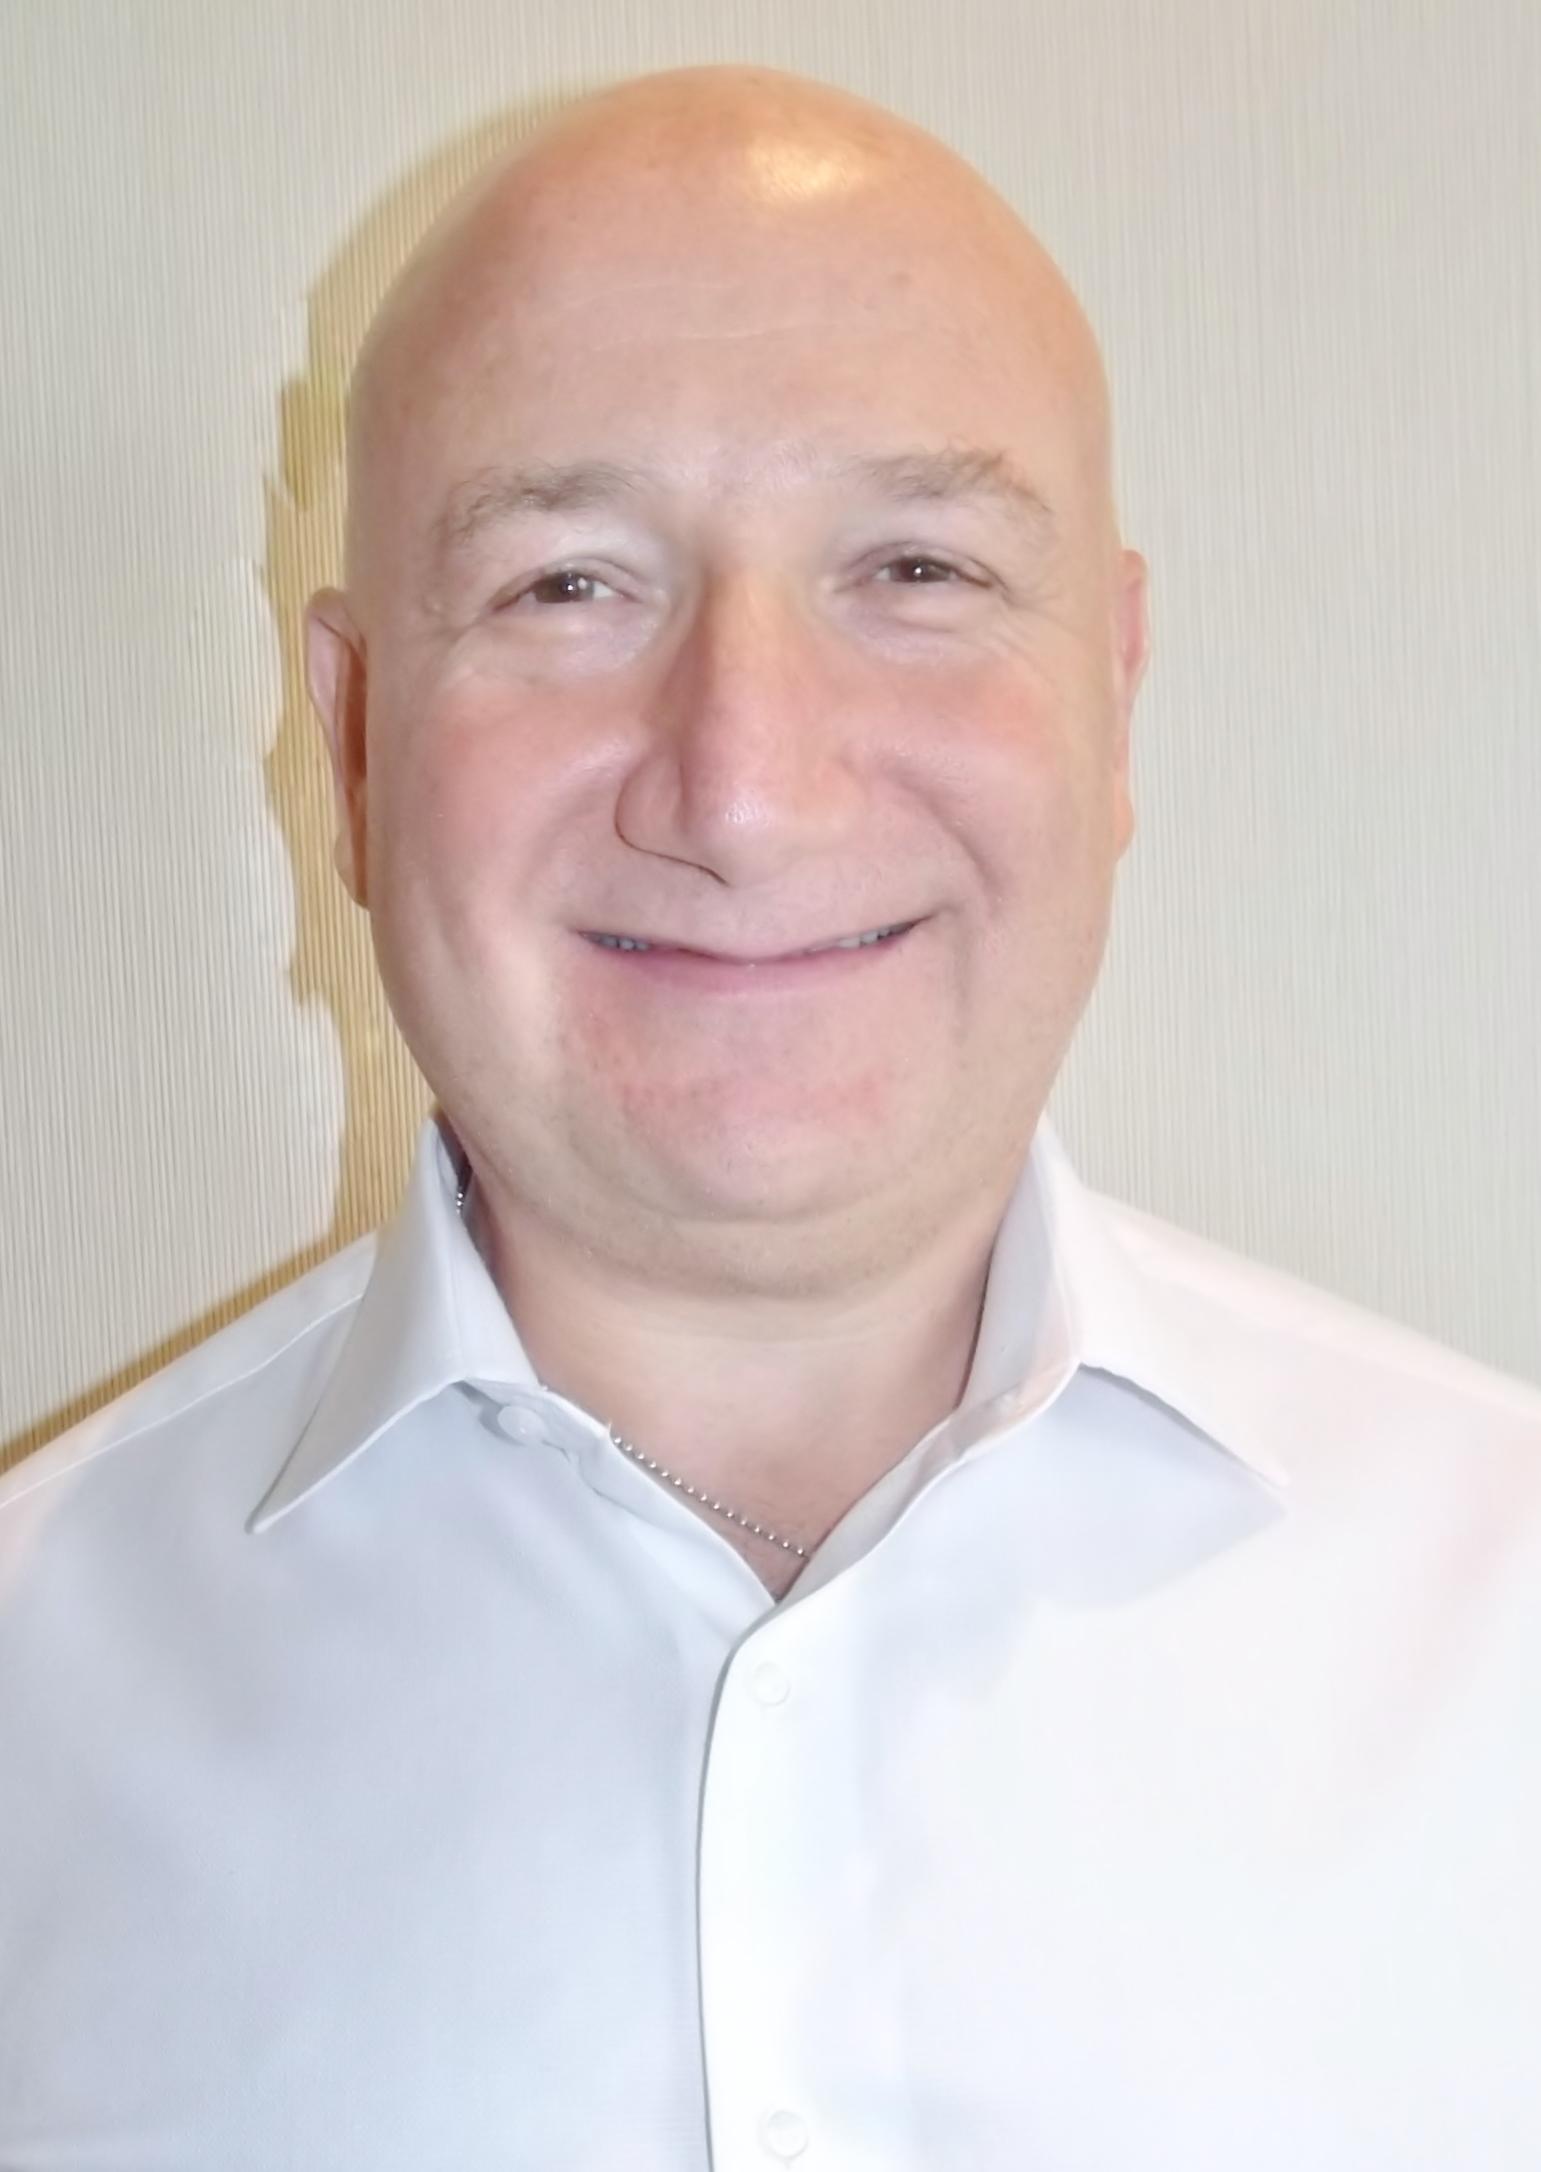 Charles Burchhardt